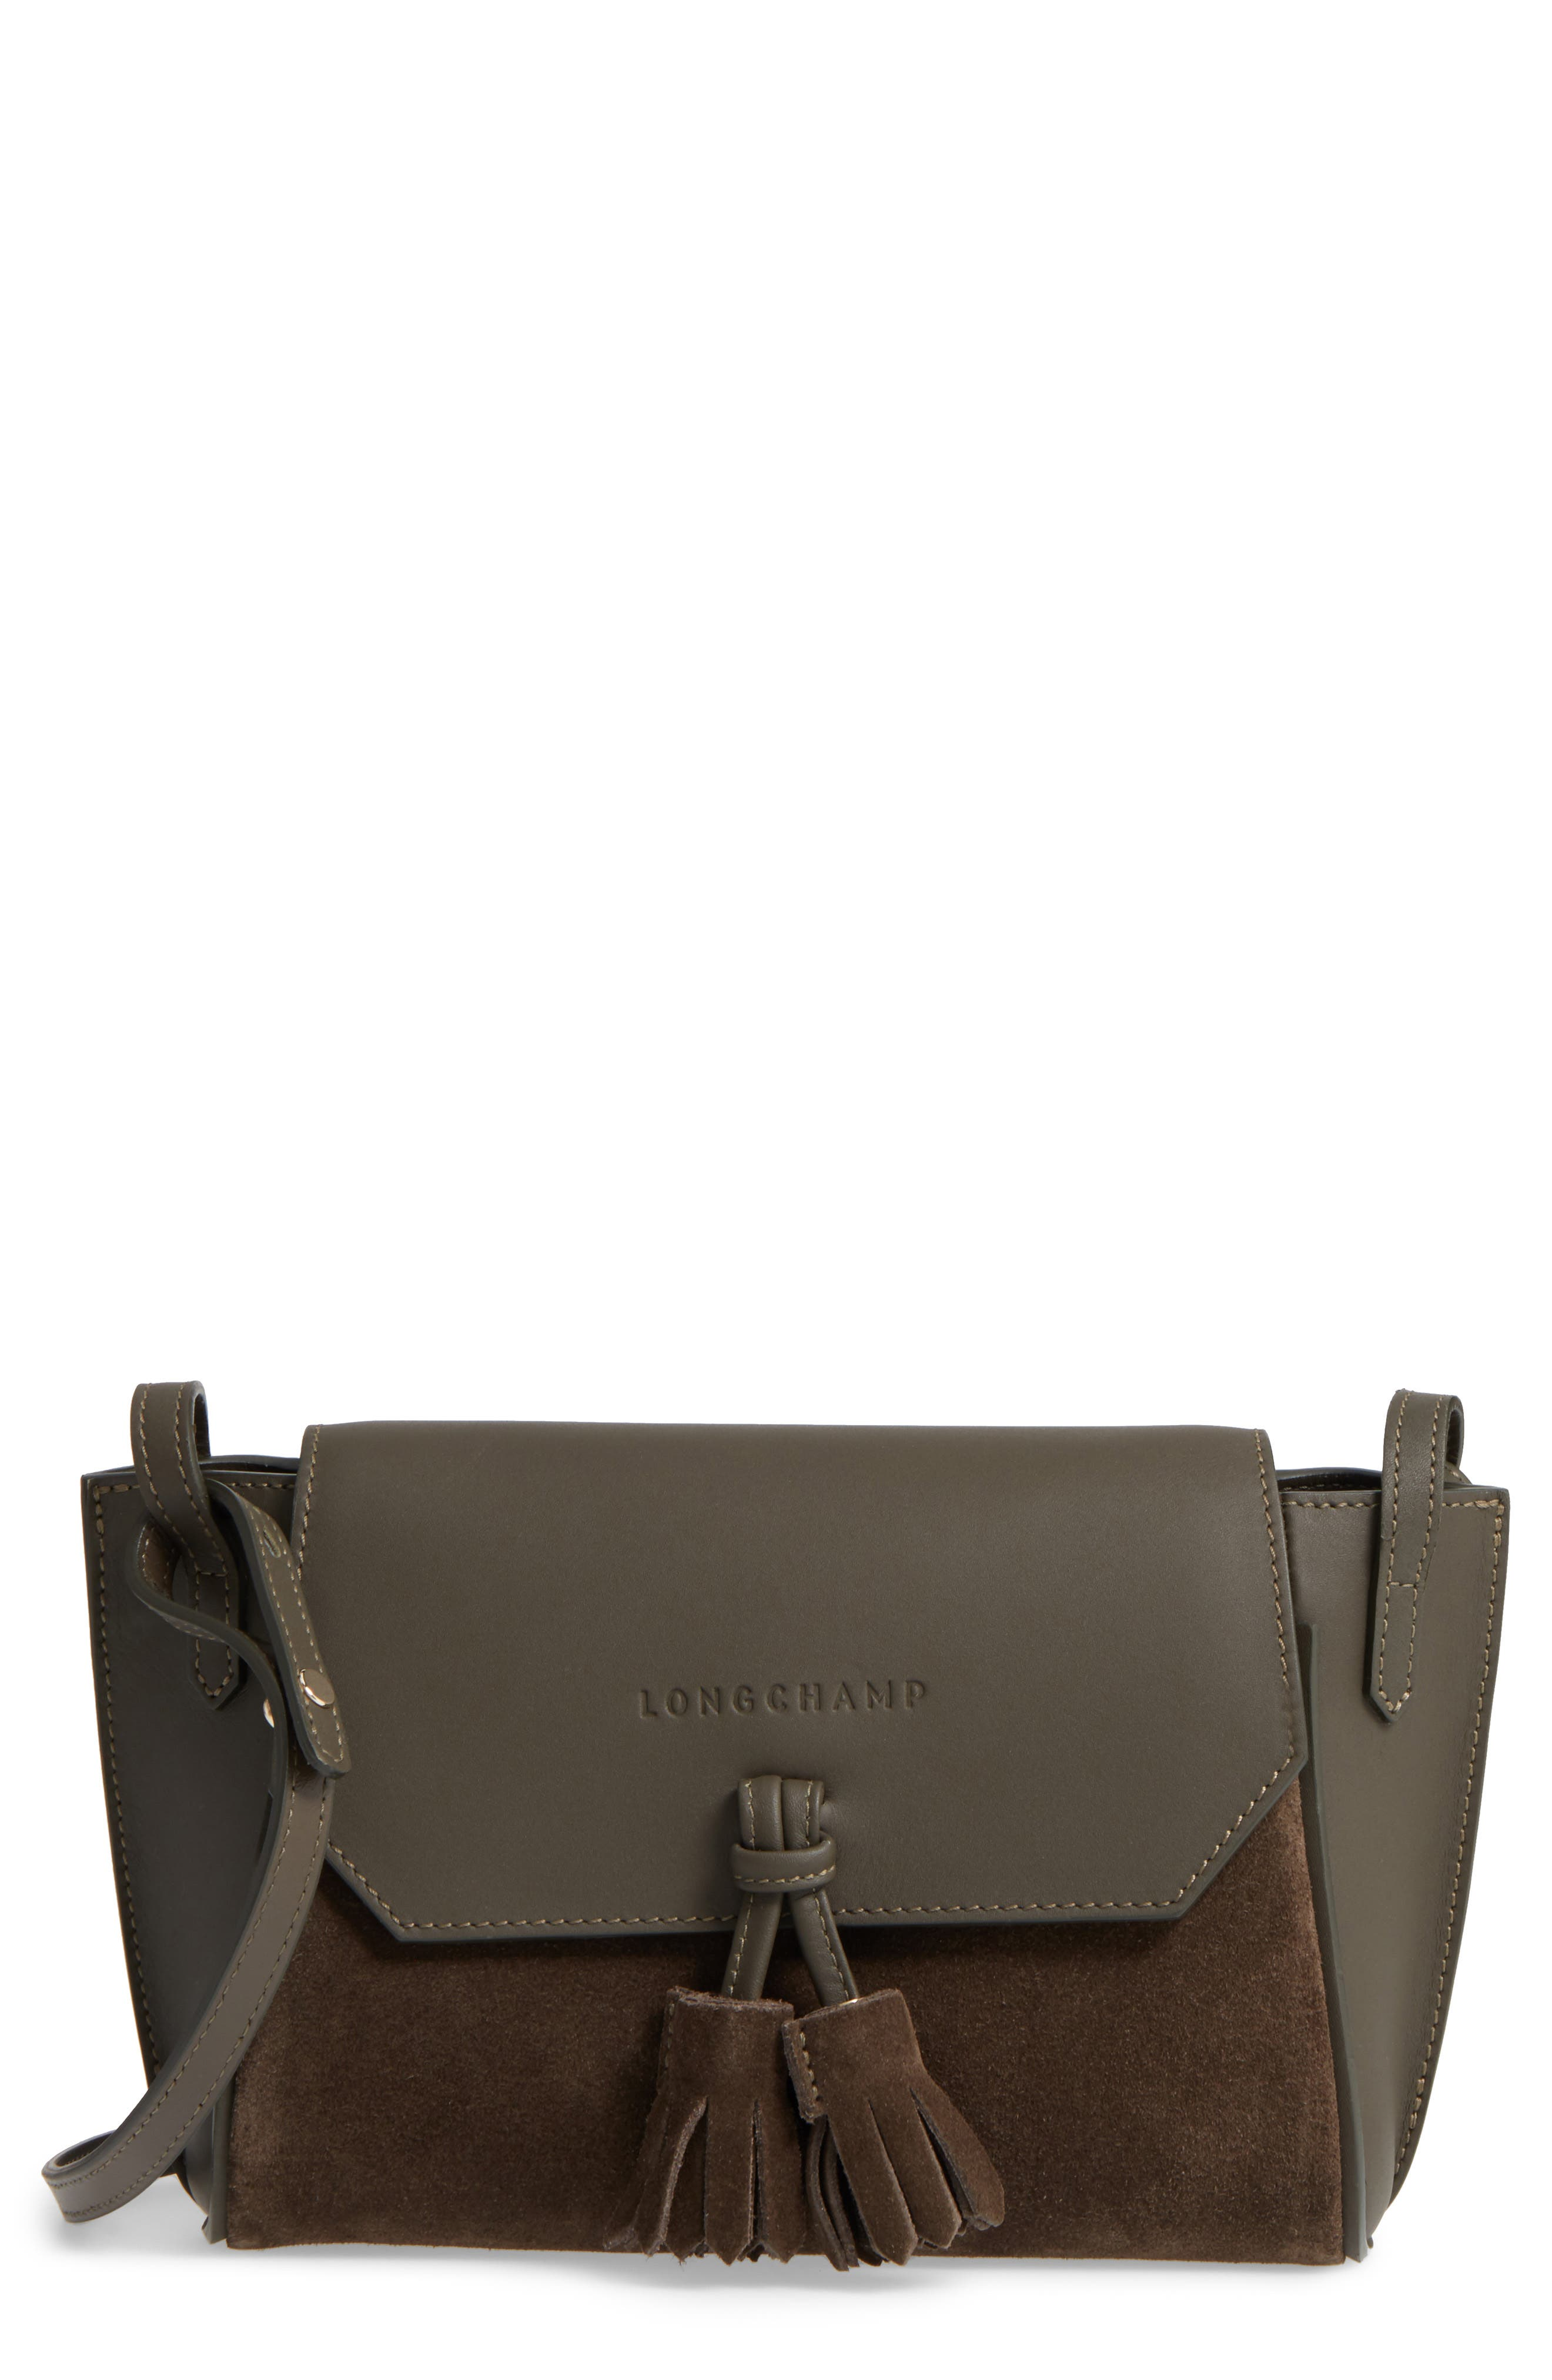 Main Image - Longchamp Small Penelope Leather Crossbody Bag